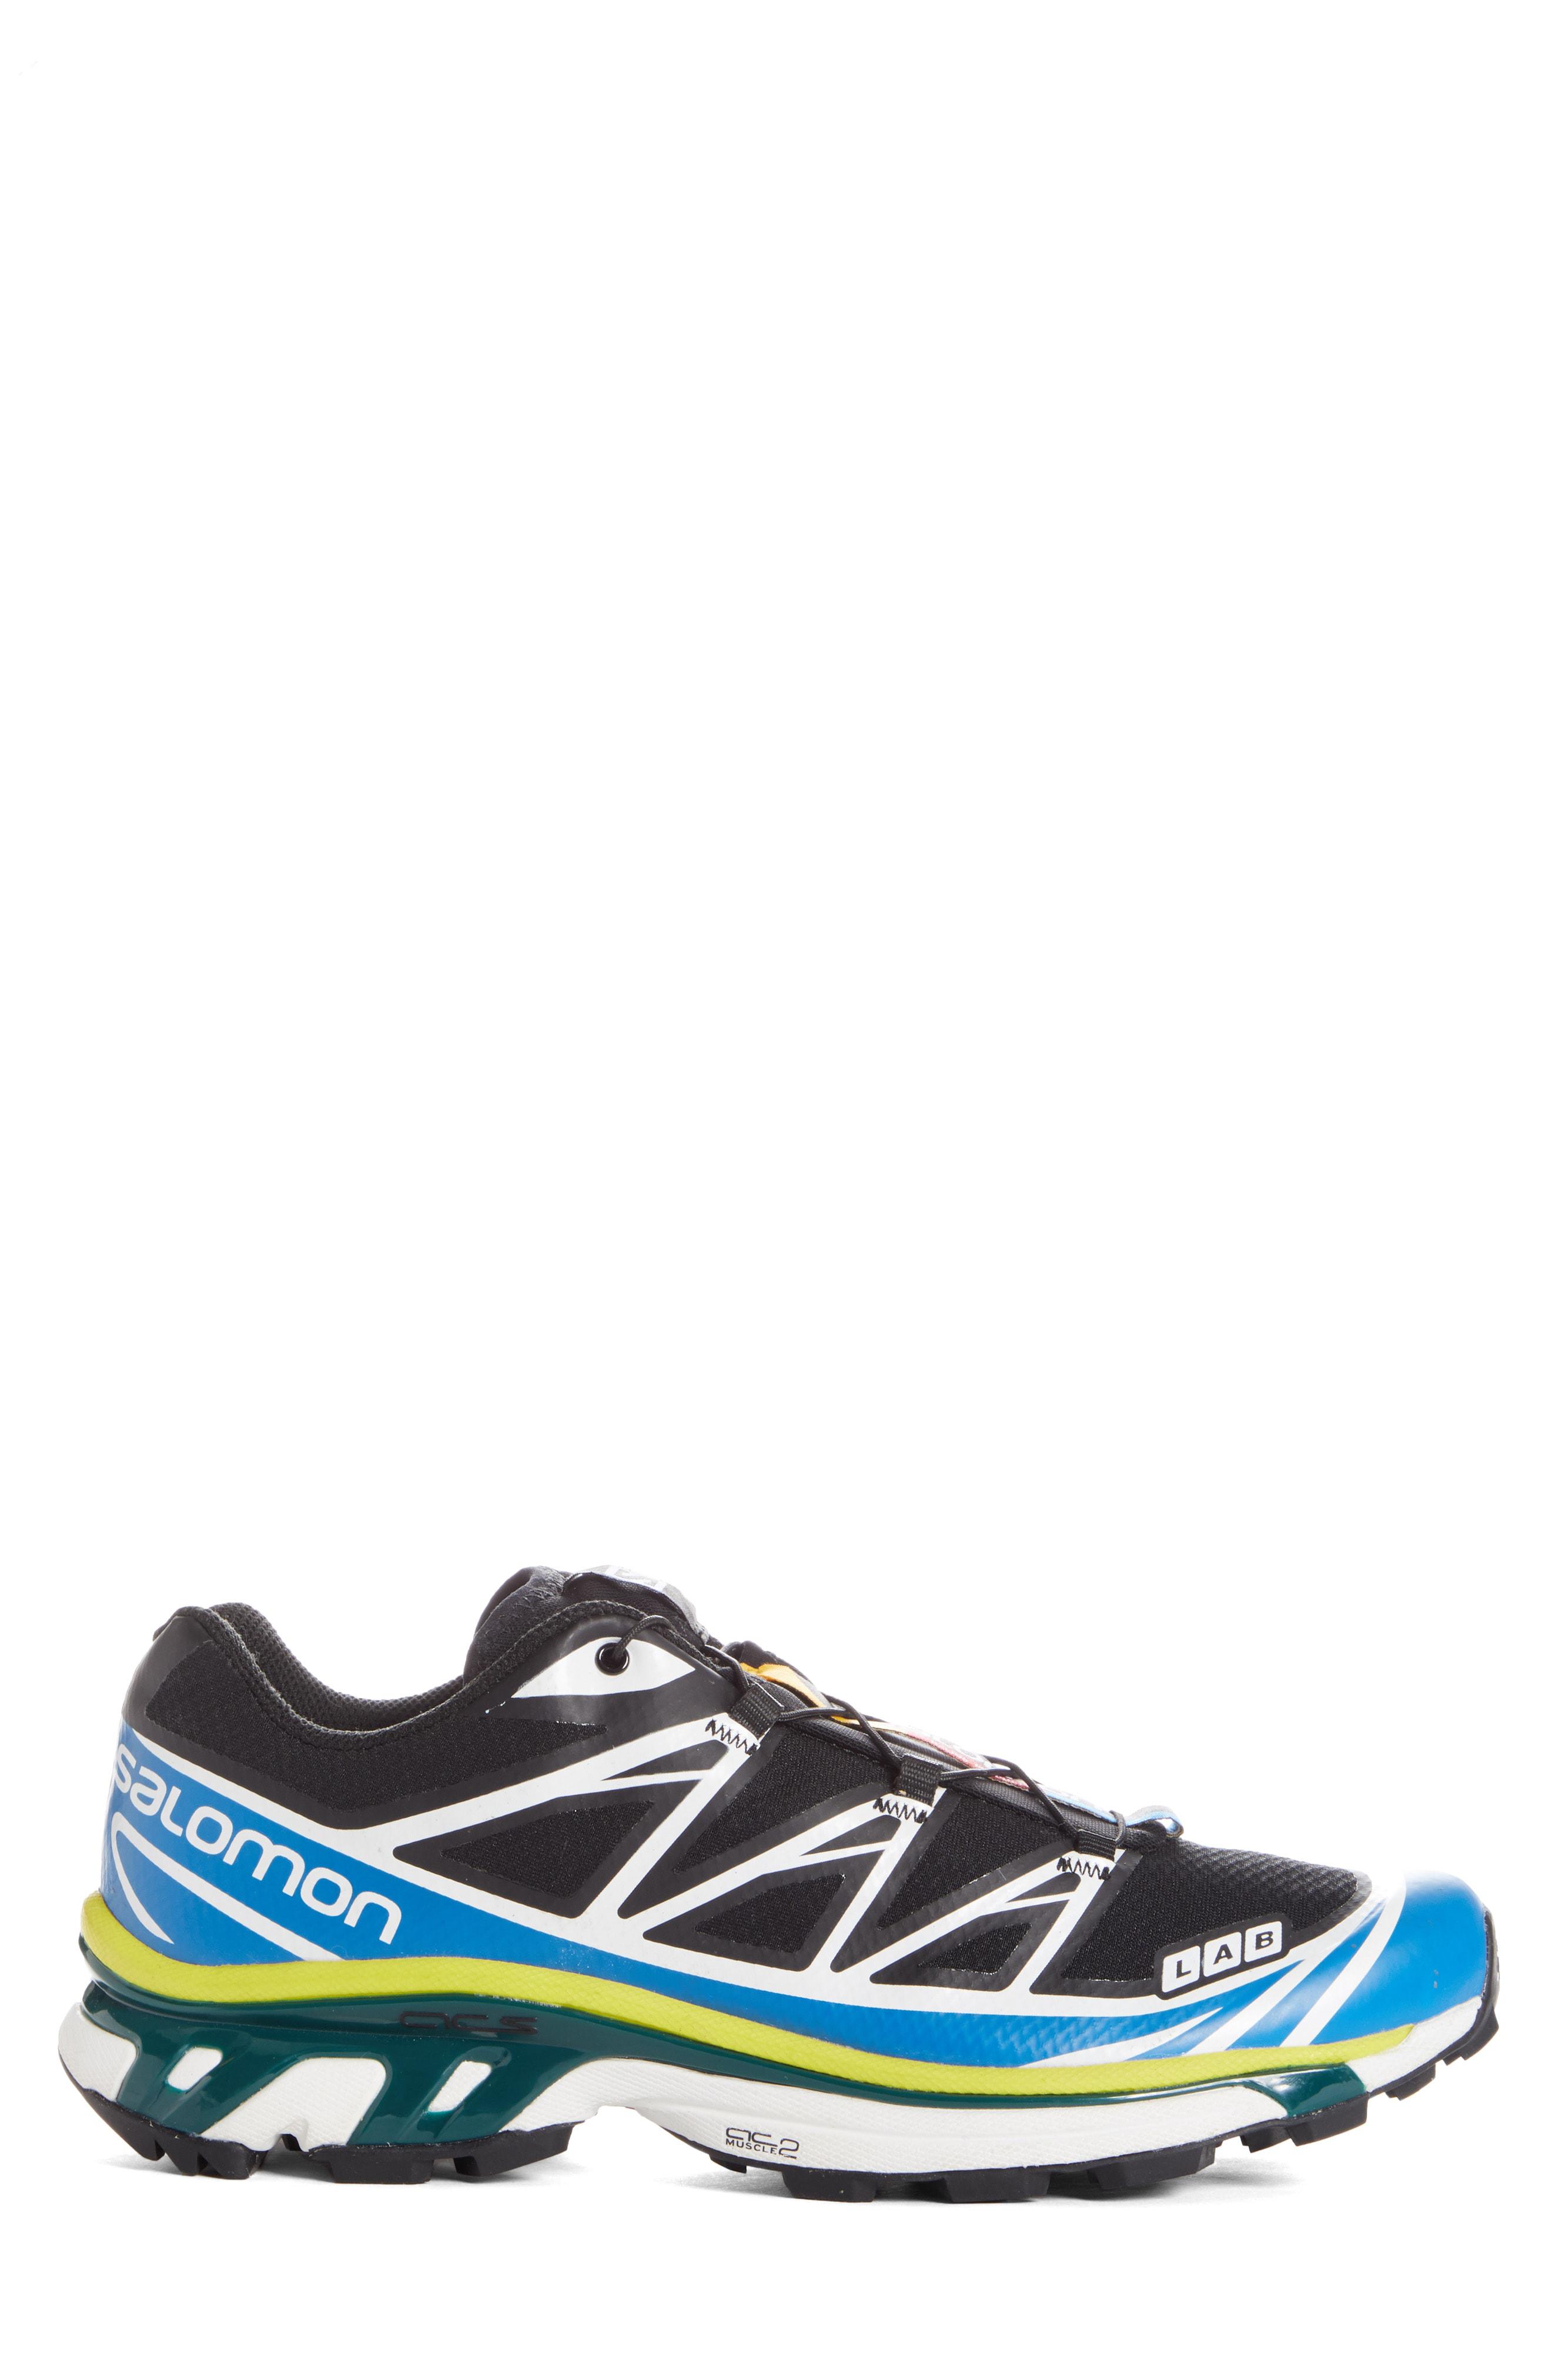 acf332f5a364f Salomon S Lab Xt-6 Softground Adv Ad Trail Running Shoe In Black ...